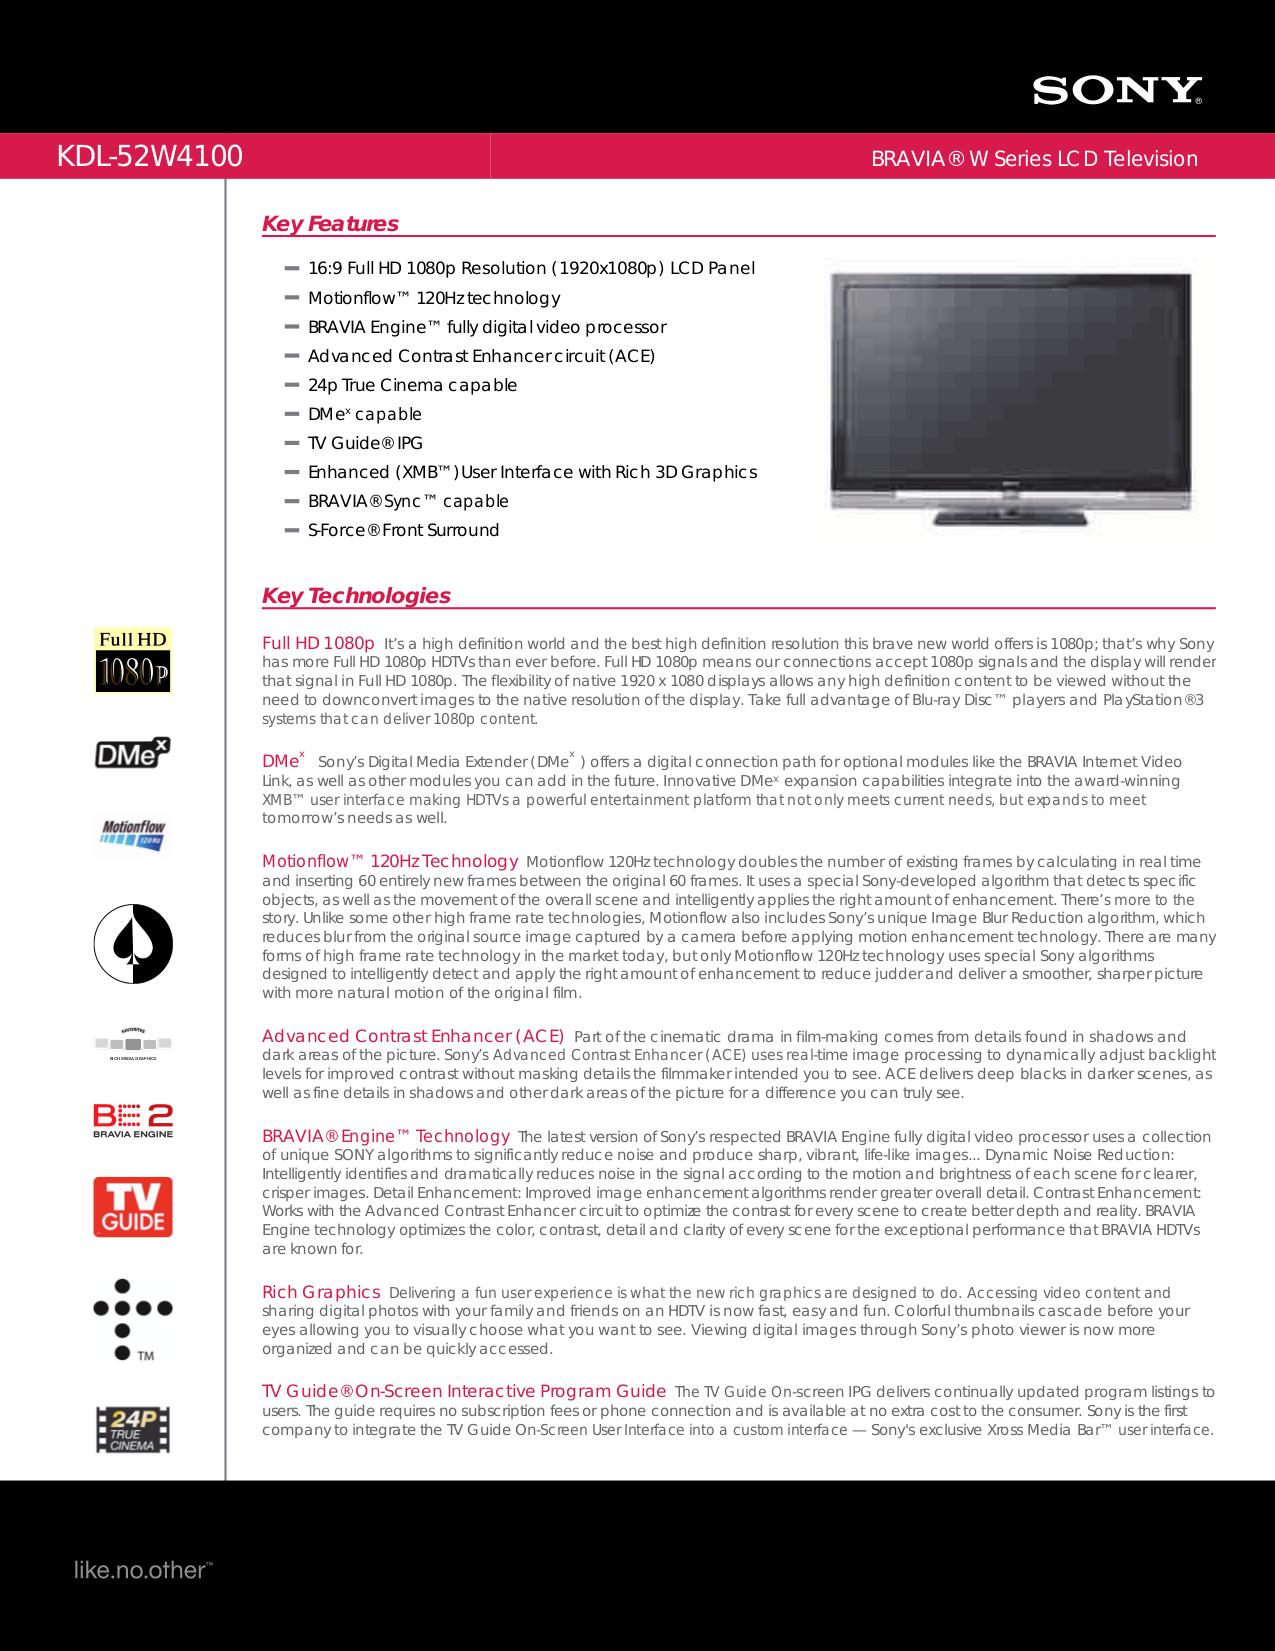 download free pdf for sony bravia kdl 52w4100 tv manual rh umlib com sony kdl-52w4100 manual Sony KDL 52W4100 Manual